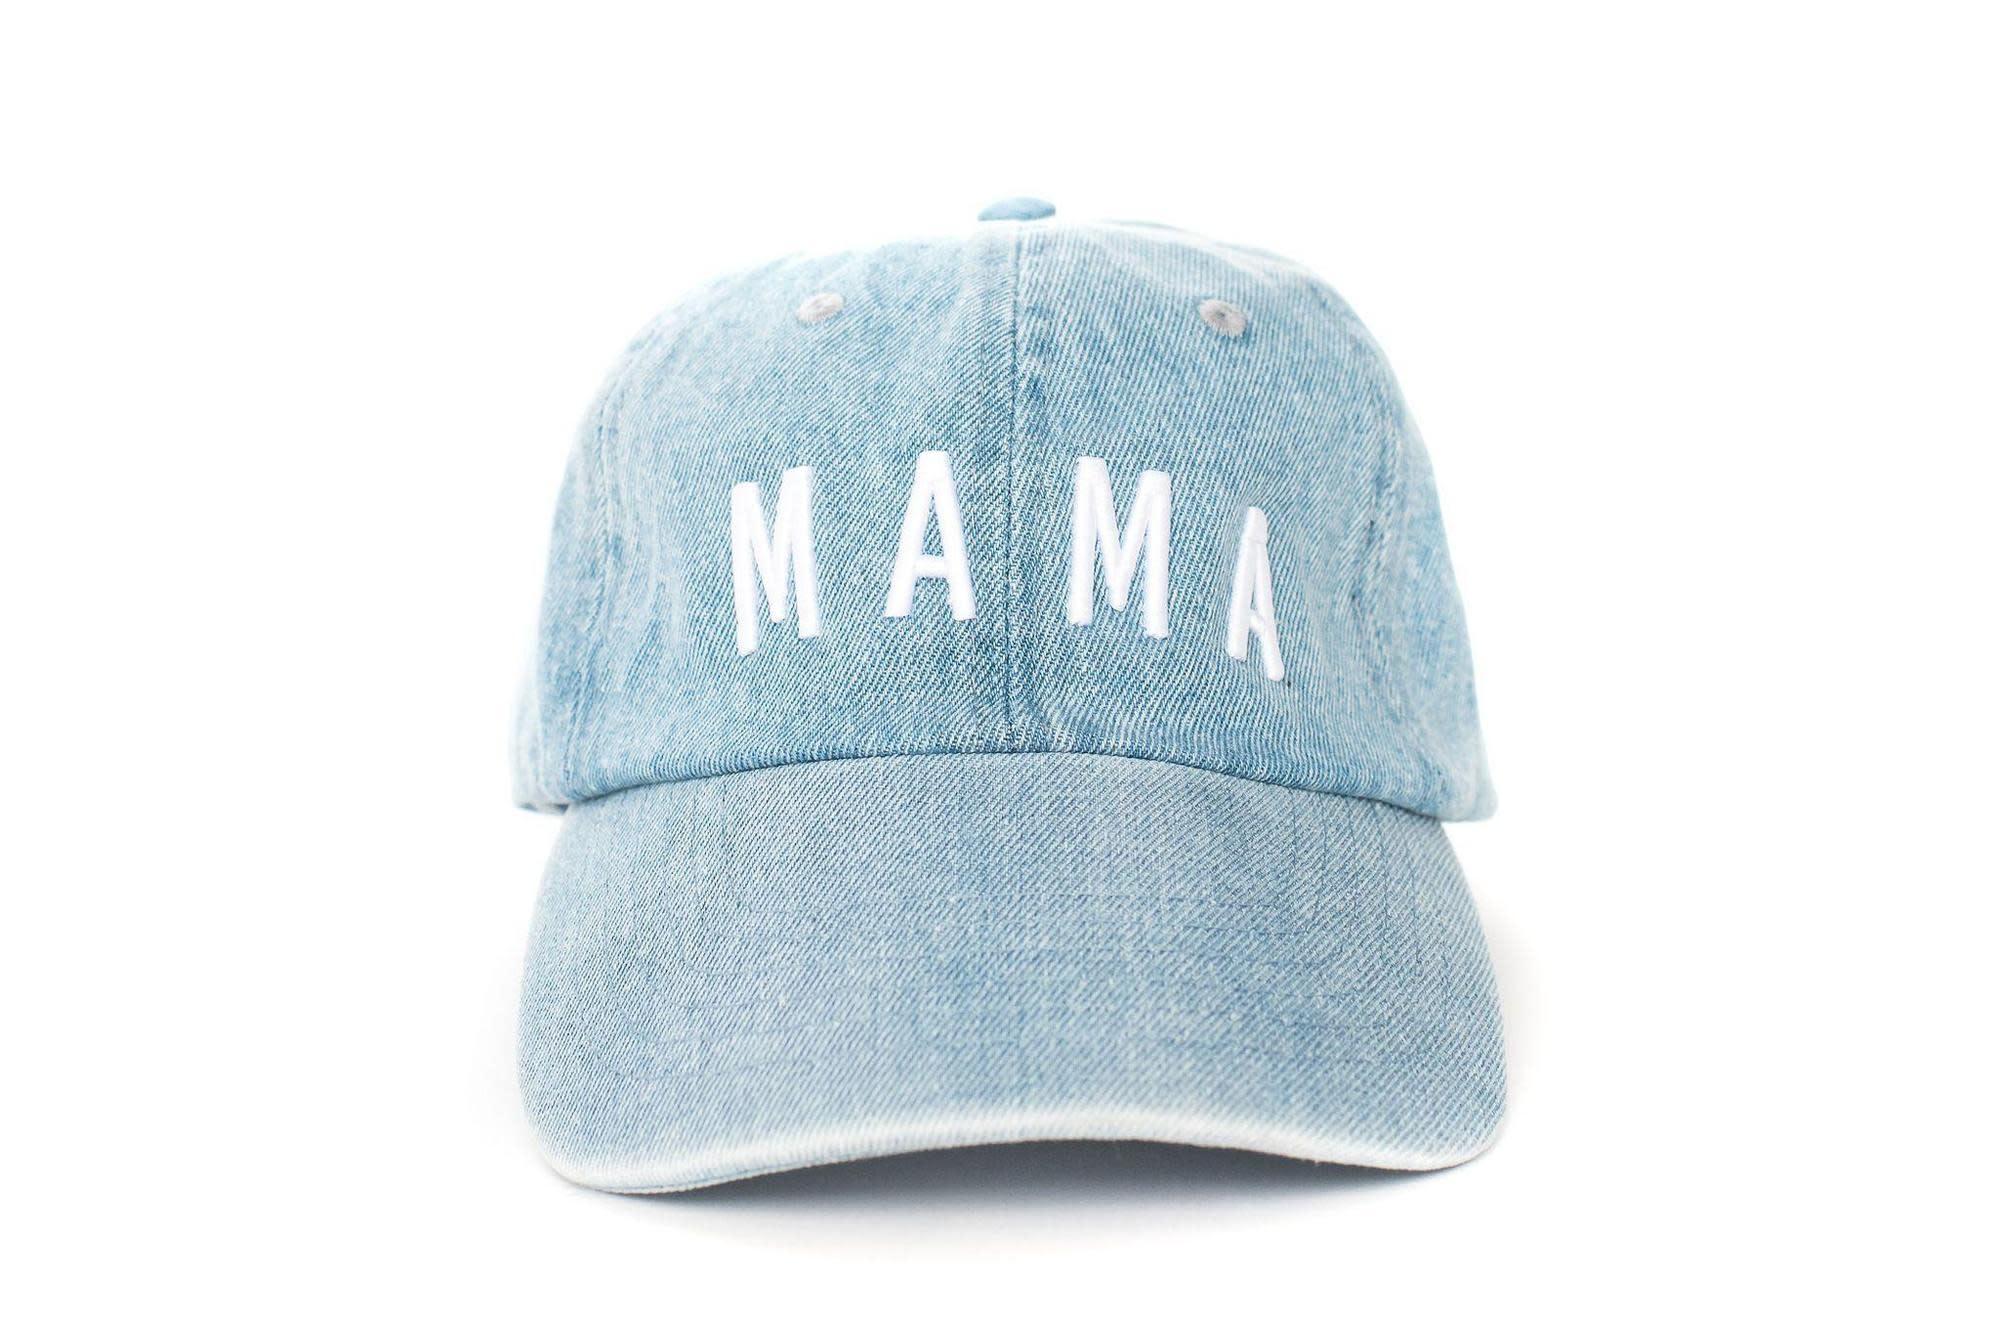 MAMA hat | Denim